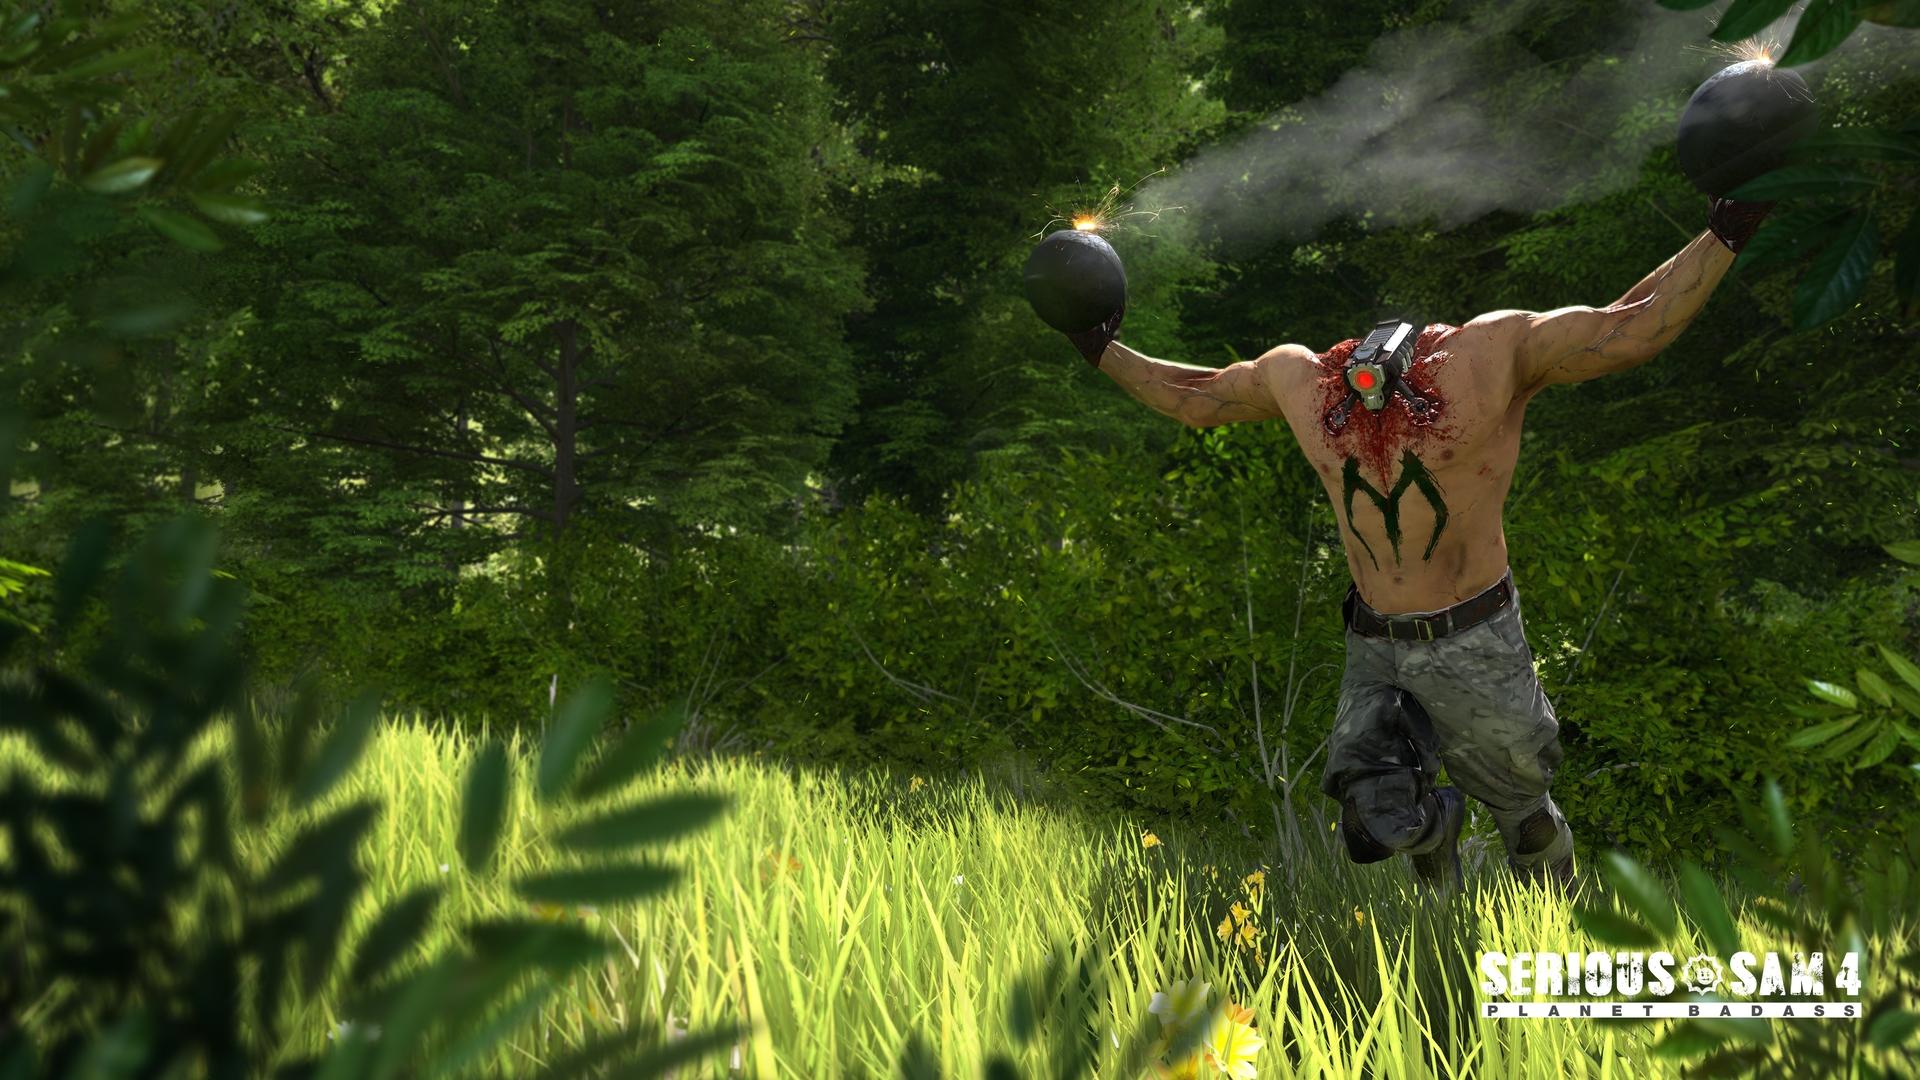 Serious Sam 4 Screenshots #5 Bild: Croteam